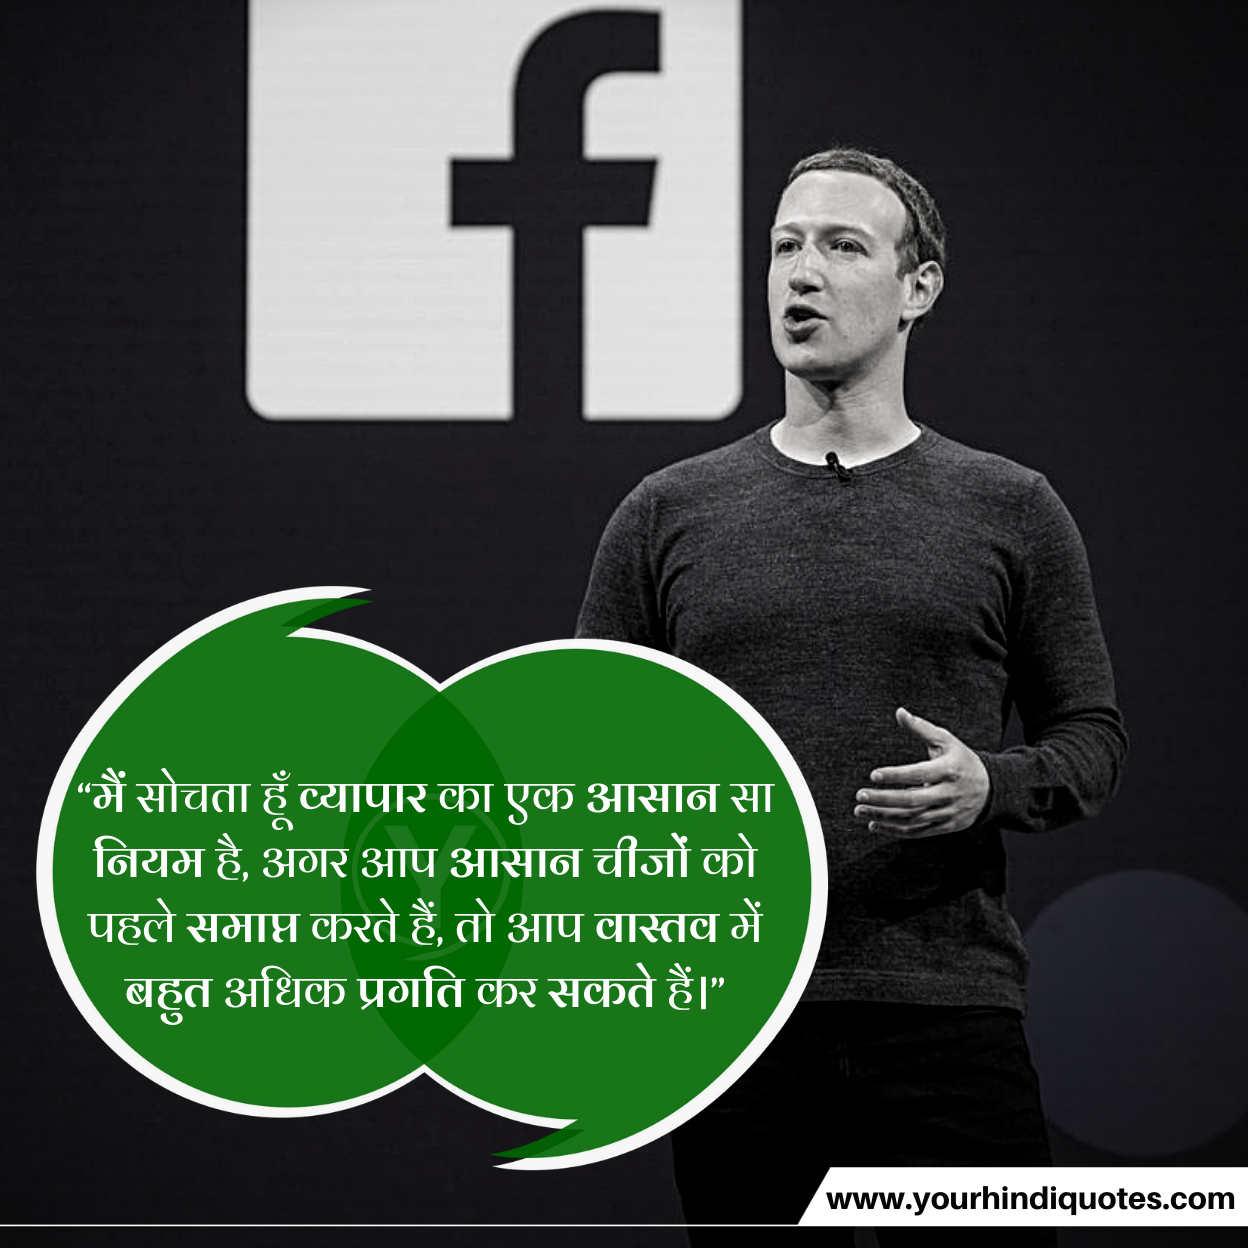 Mark Zuckerberg Quotes Hindi Images